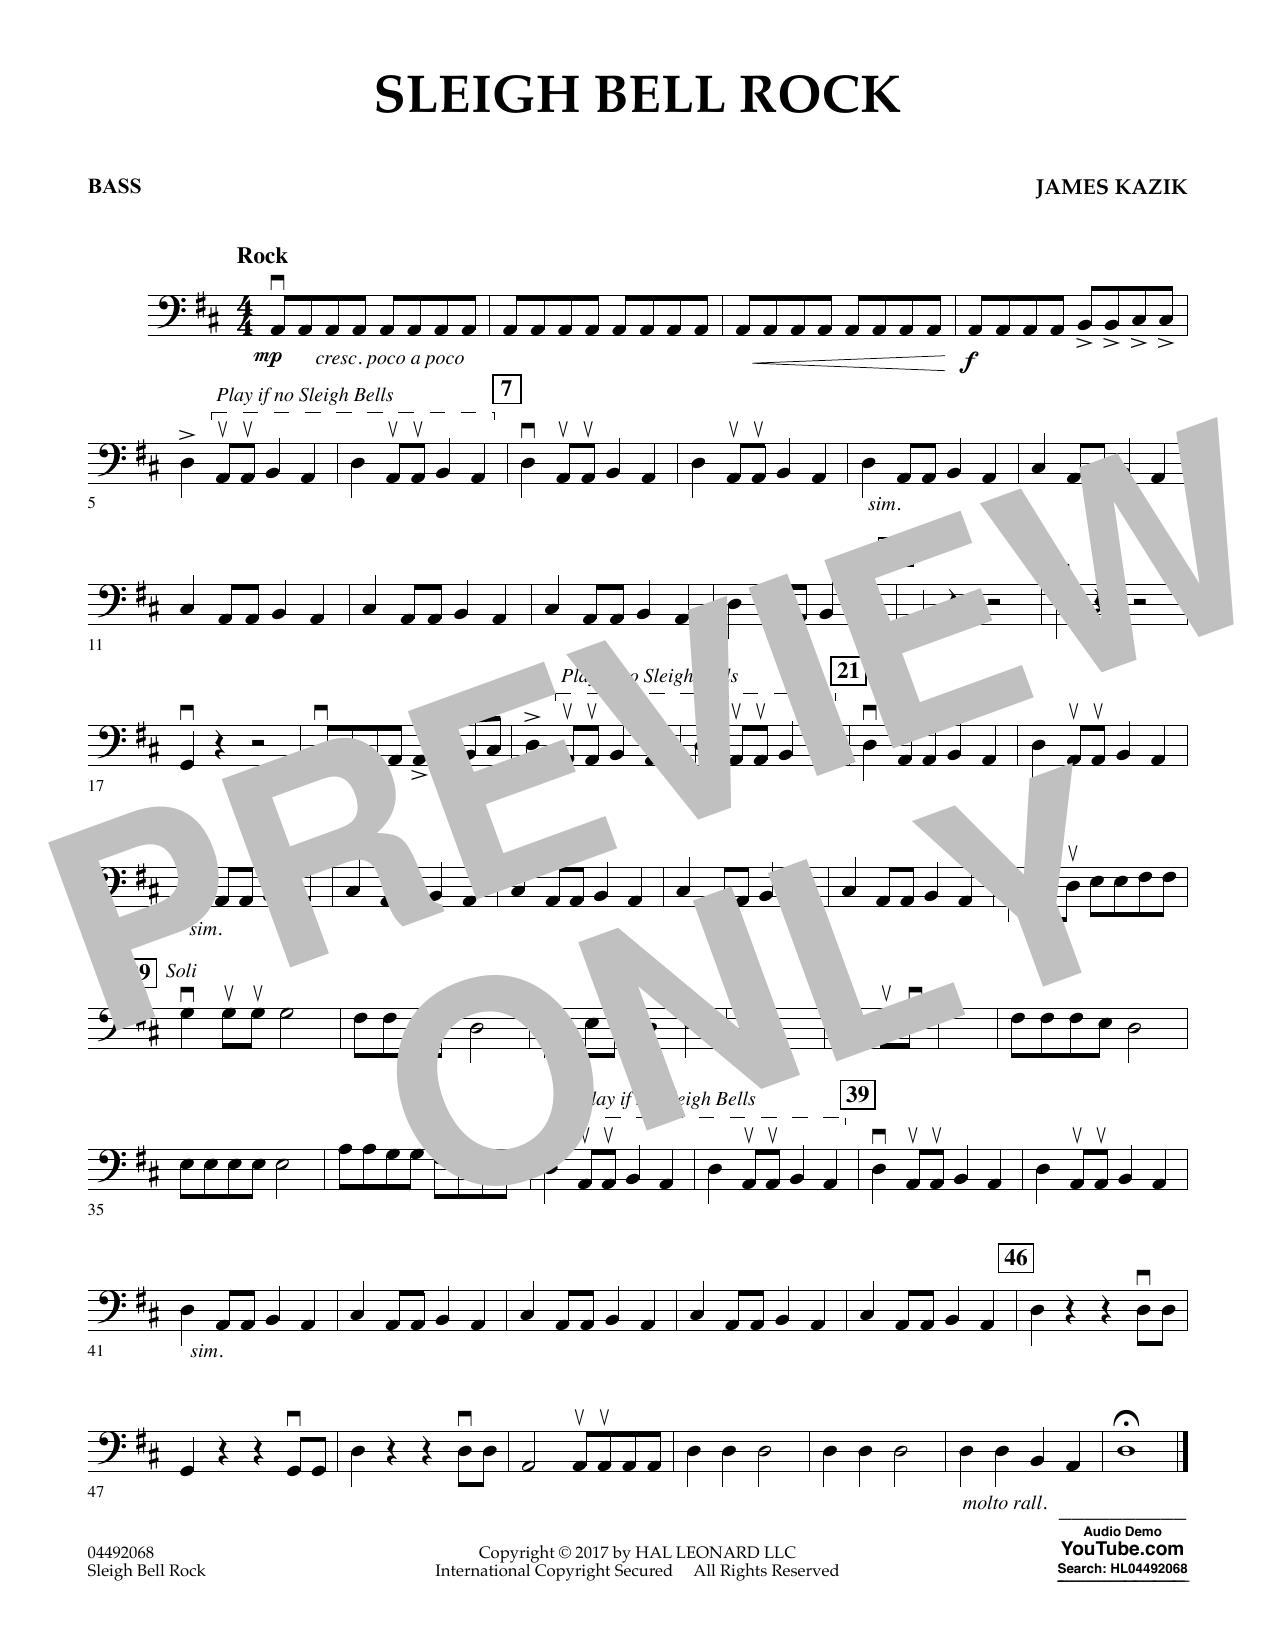 James Kazik Sleigh Bell Rock - Bass sheet music notes and chords. Download Printable PDF.